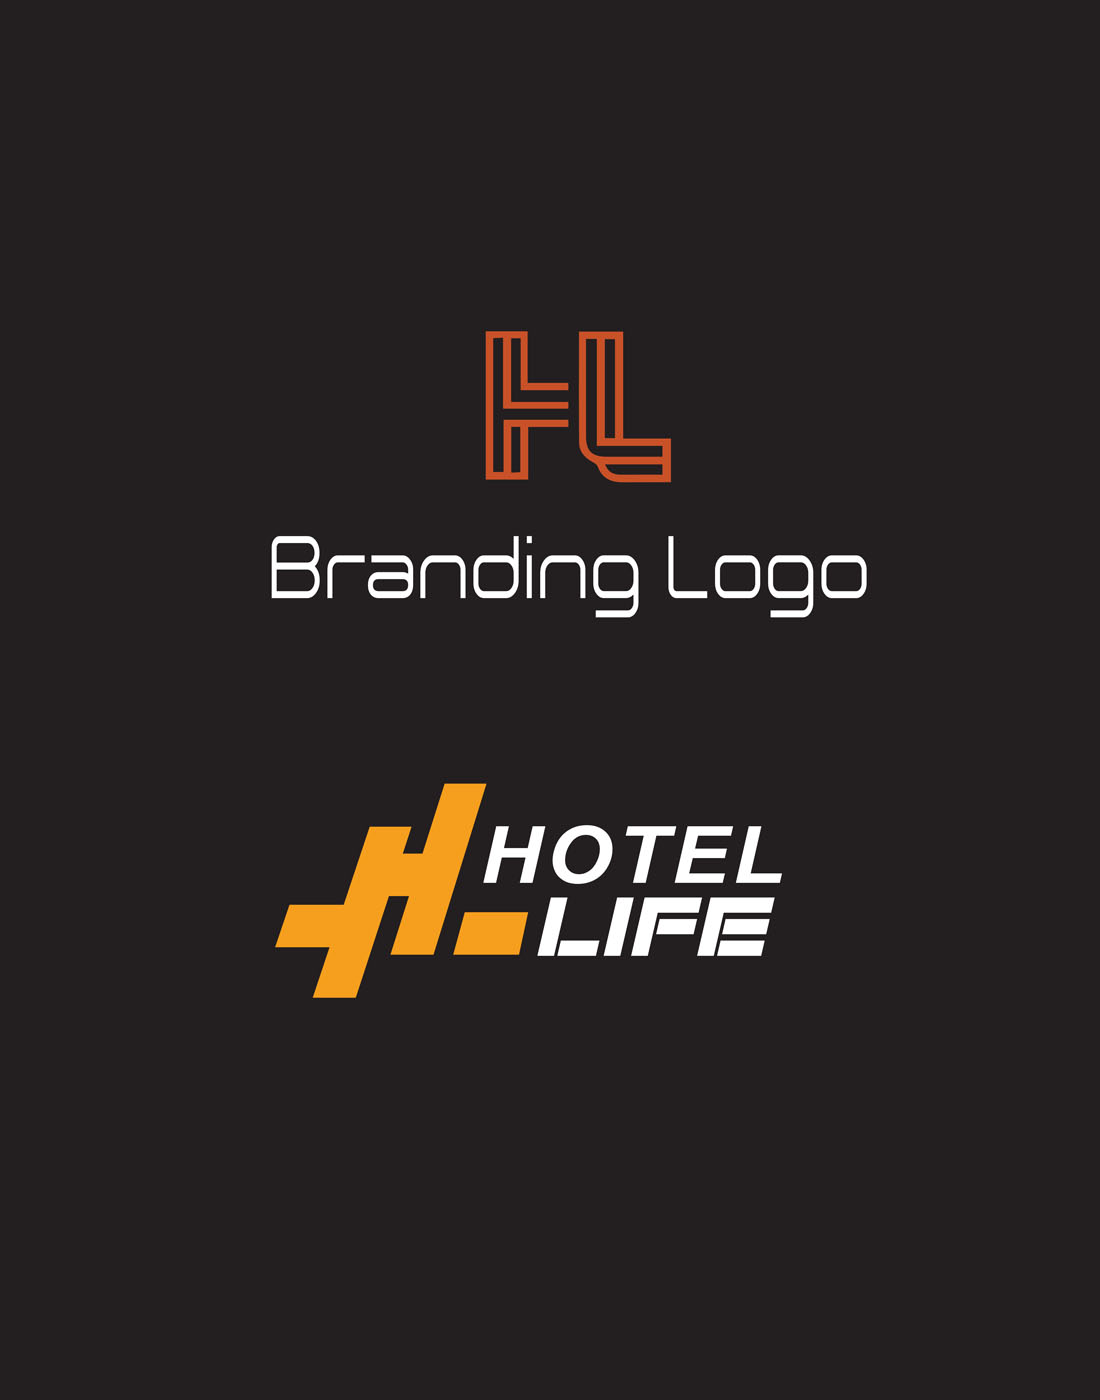 Hl Logo Images & Vectors